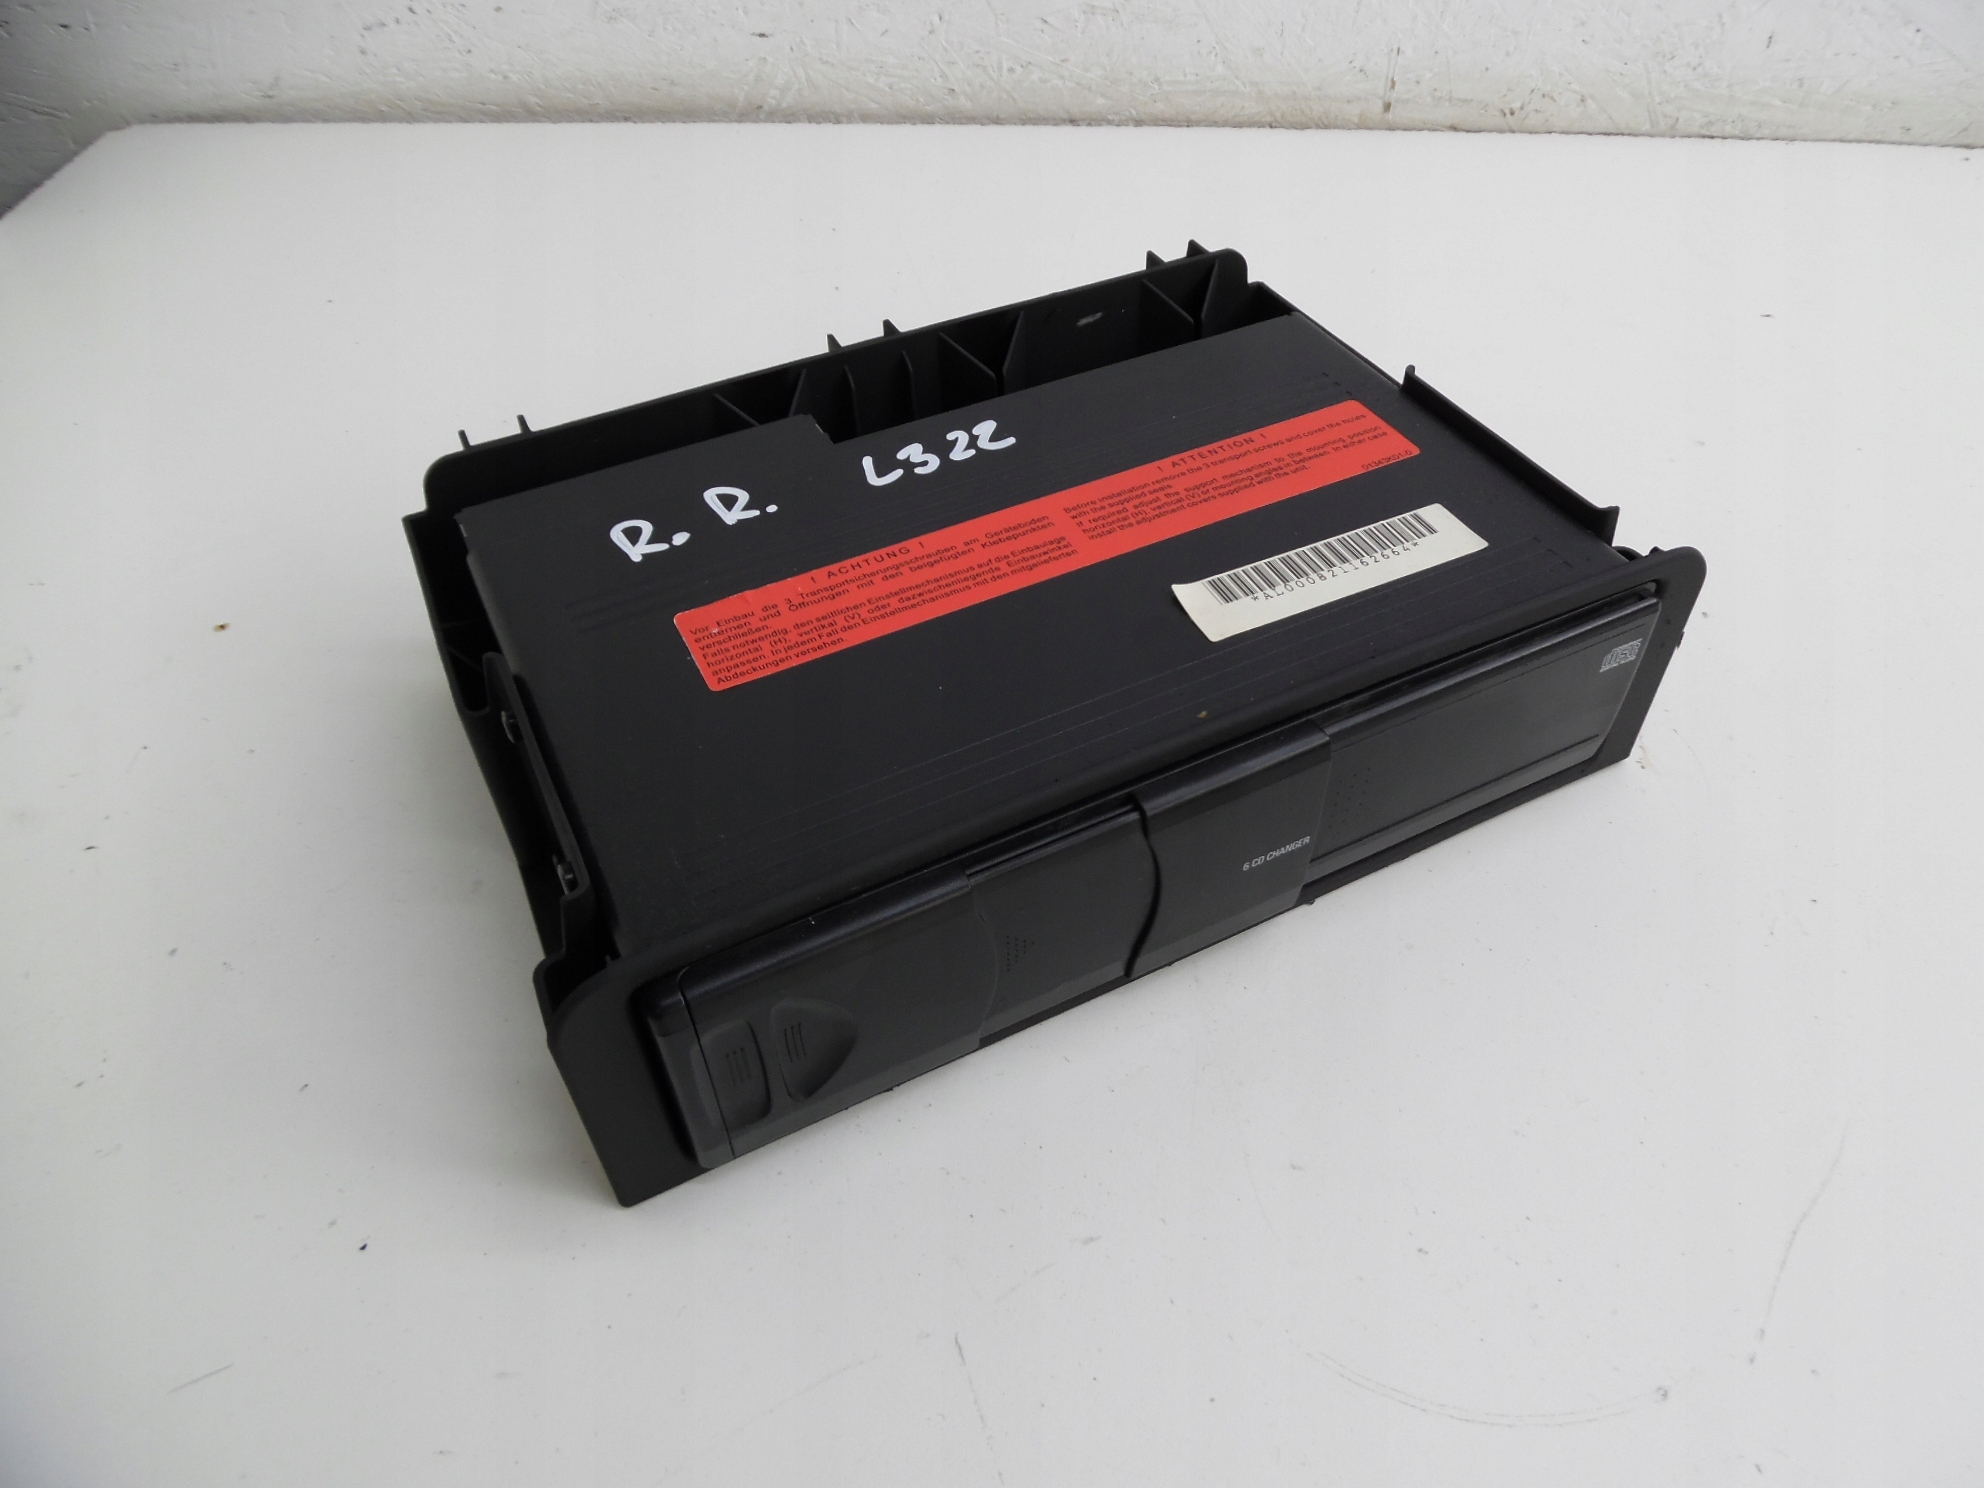 range rover l322 cd-чейнджер cd вклад